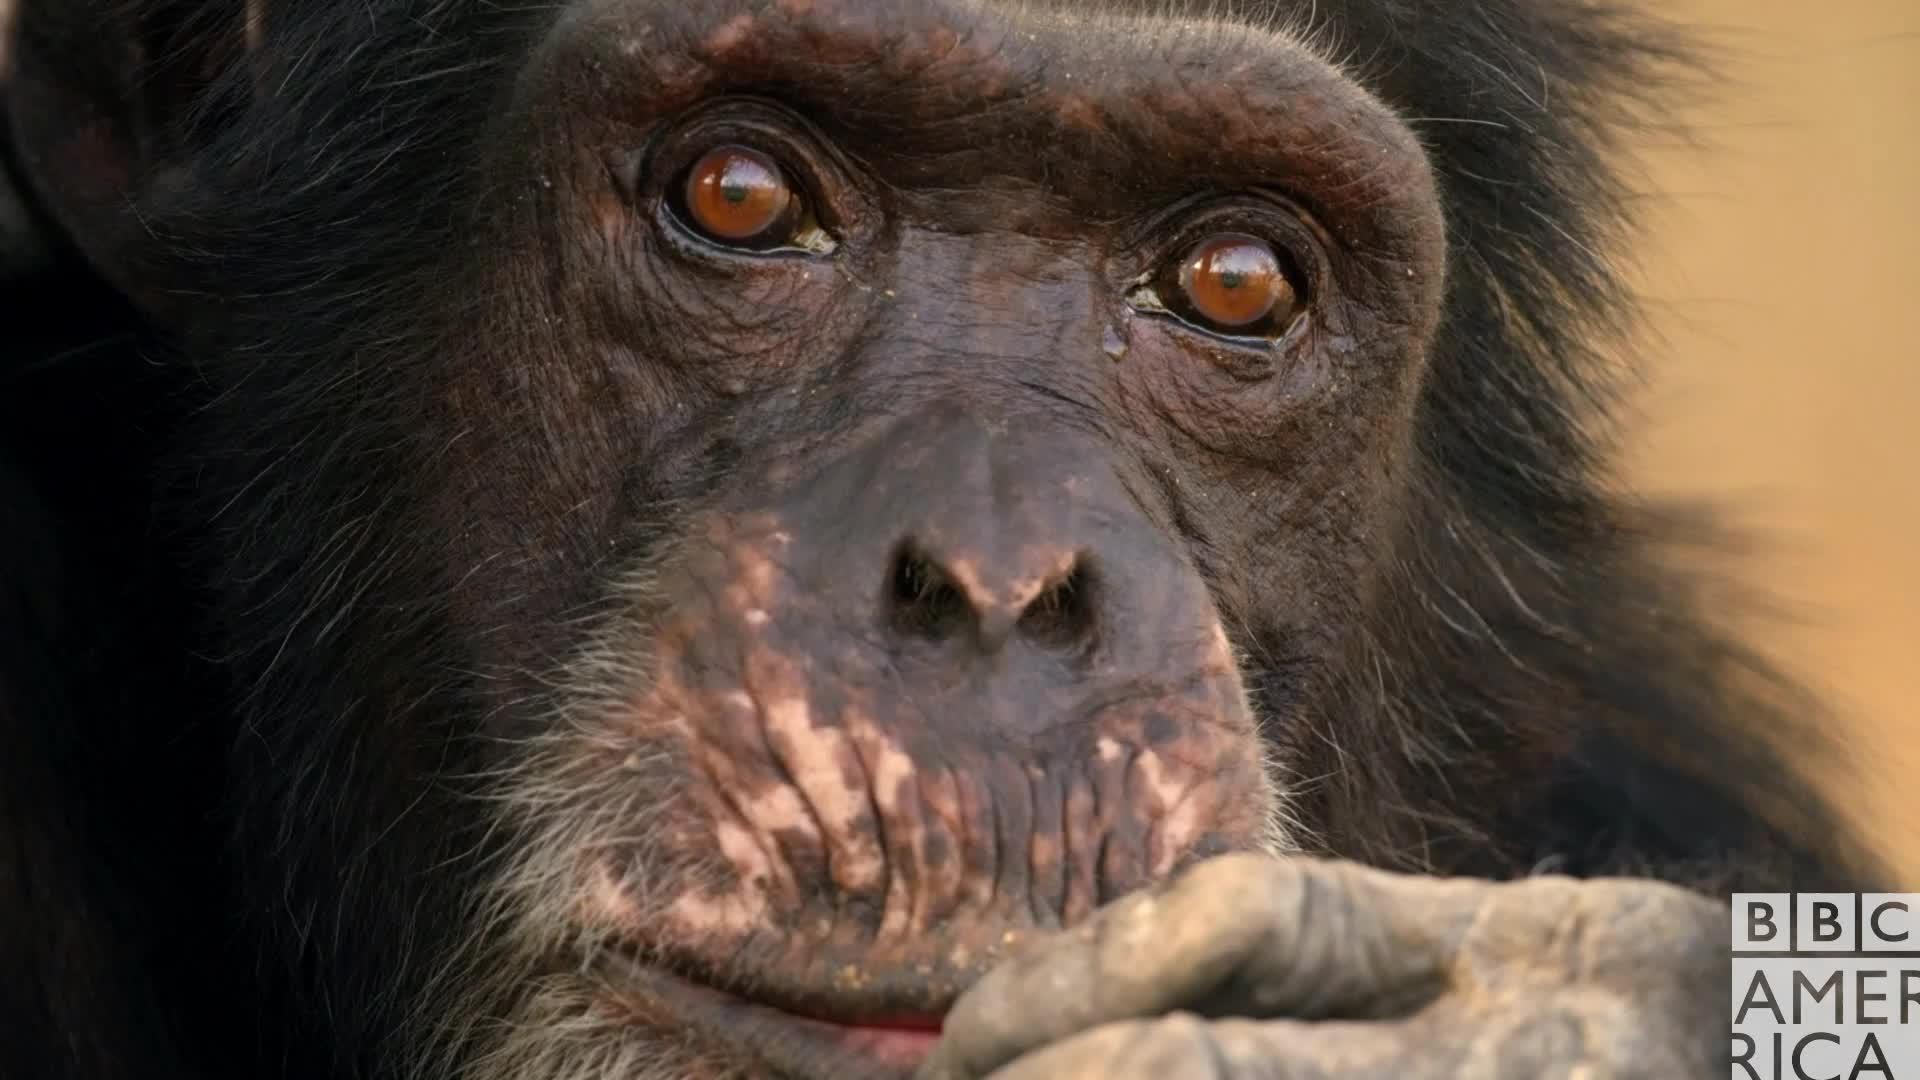 animal, animals, bbc america, bbc america dynasties, bbc america: dynasties, chimp, chimpanzee, chimpanzees, chimps, dynasties, Dynasties Chimp Thinking Hmm GIFs